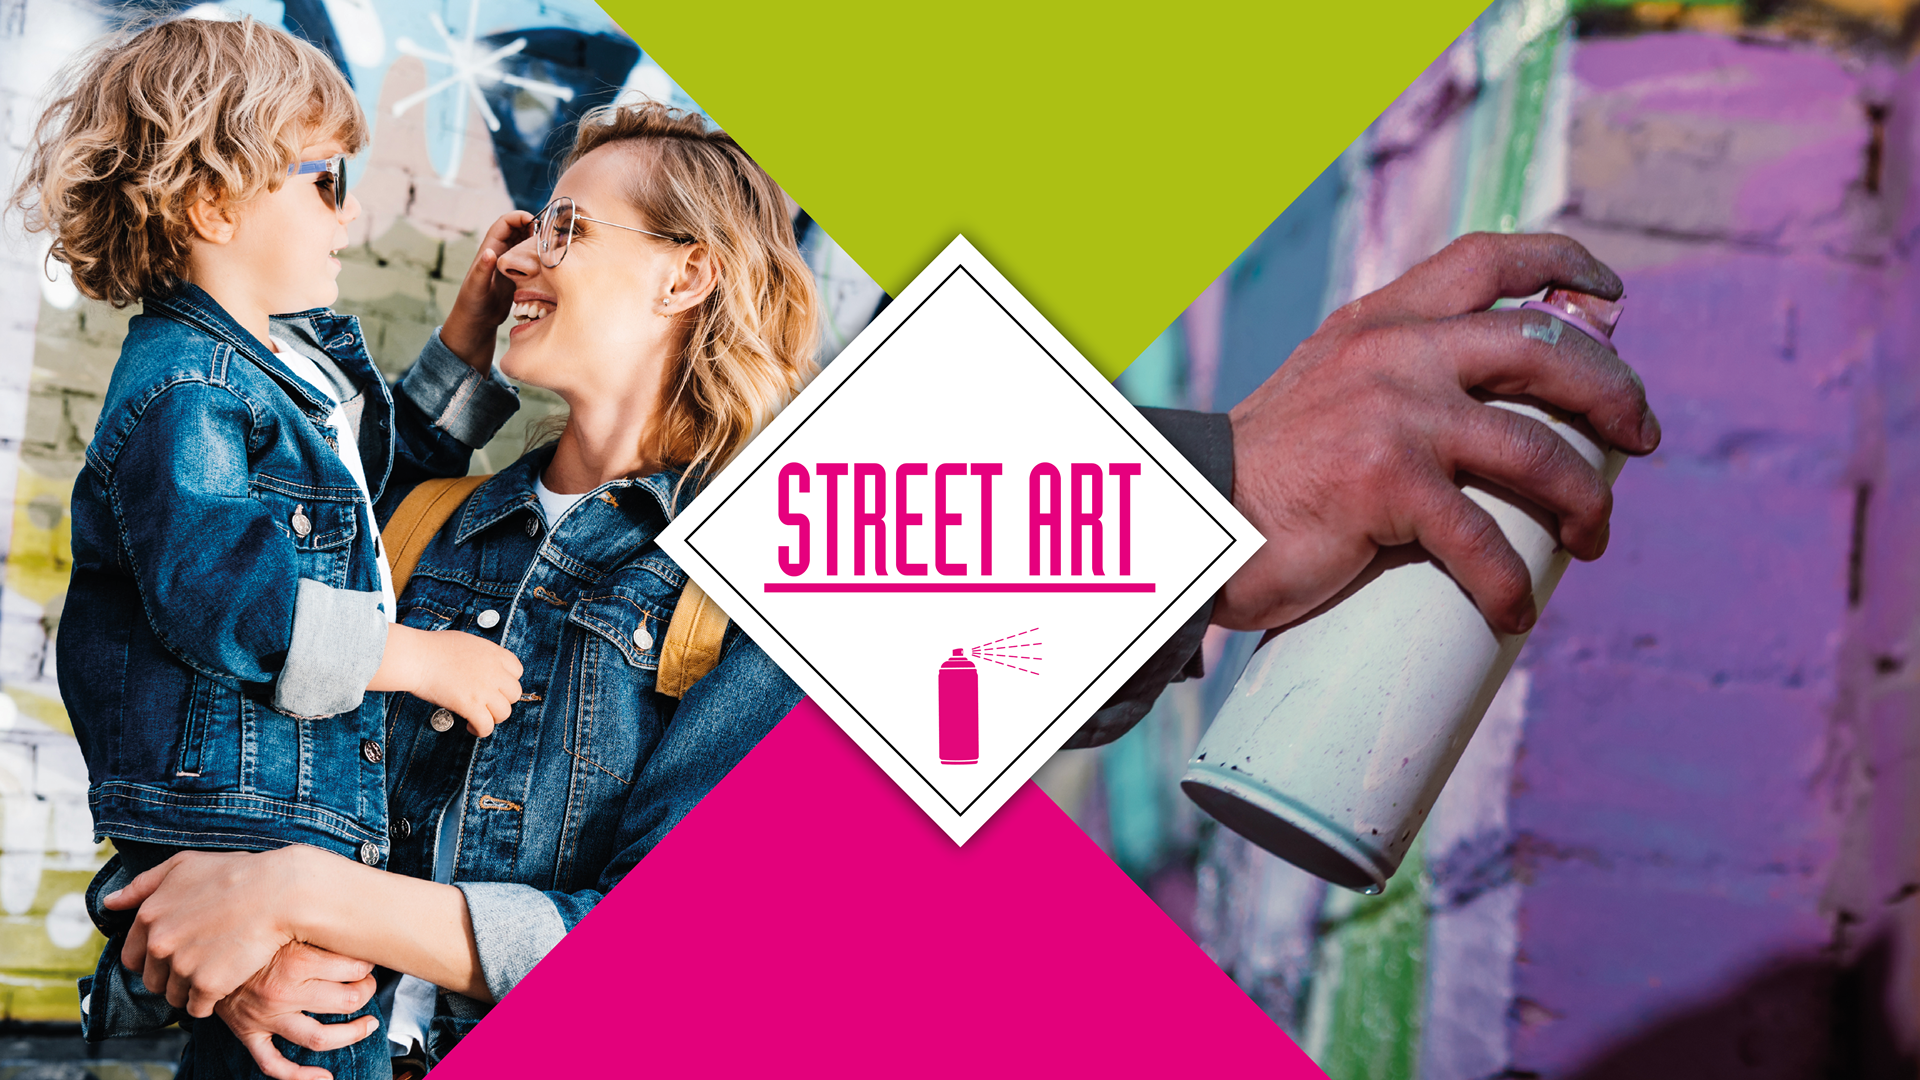 K N A S T Street Art Graffiti Lifestyle